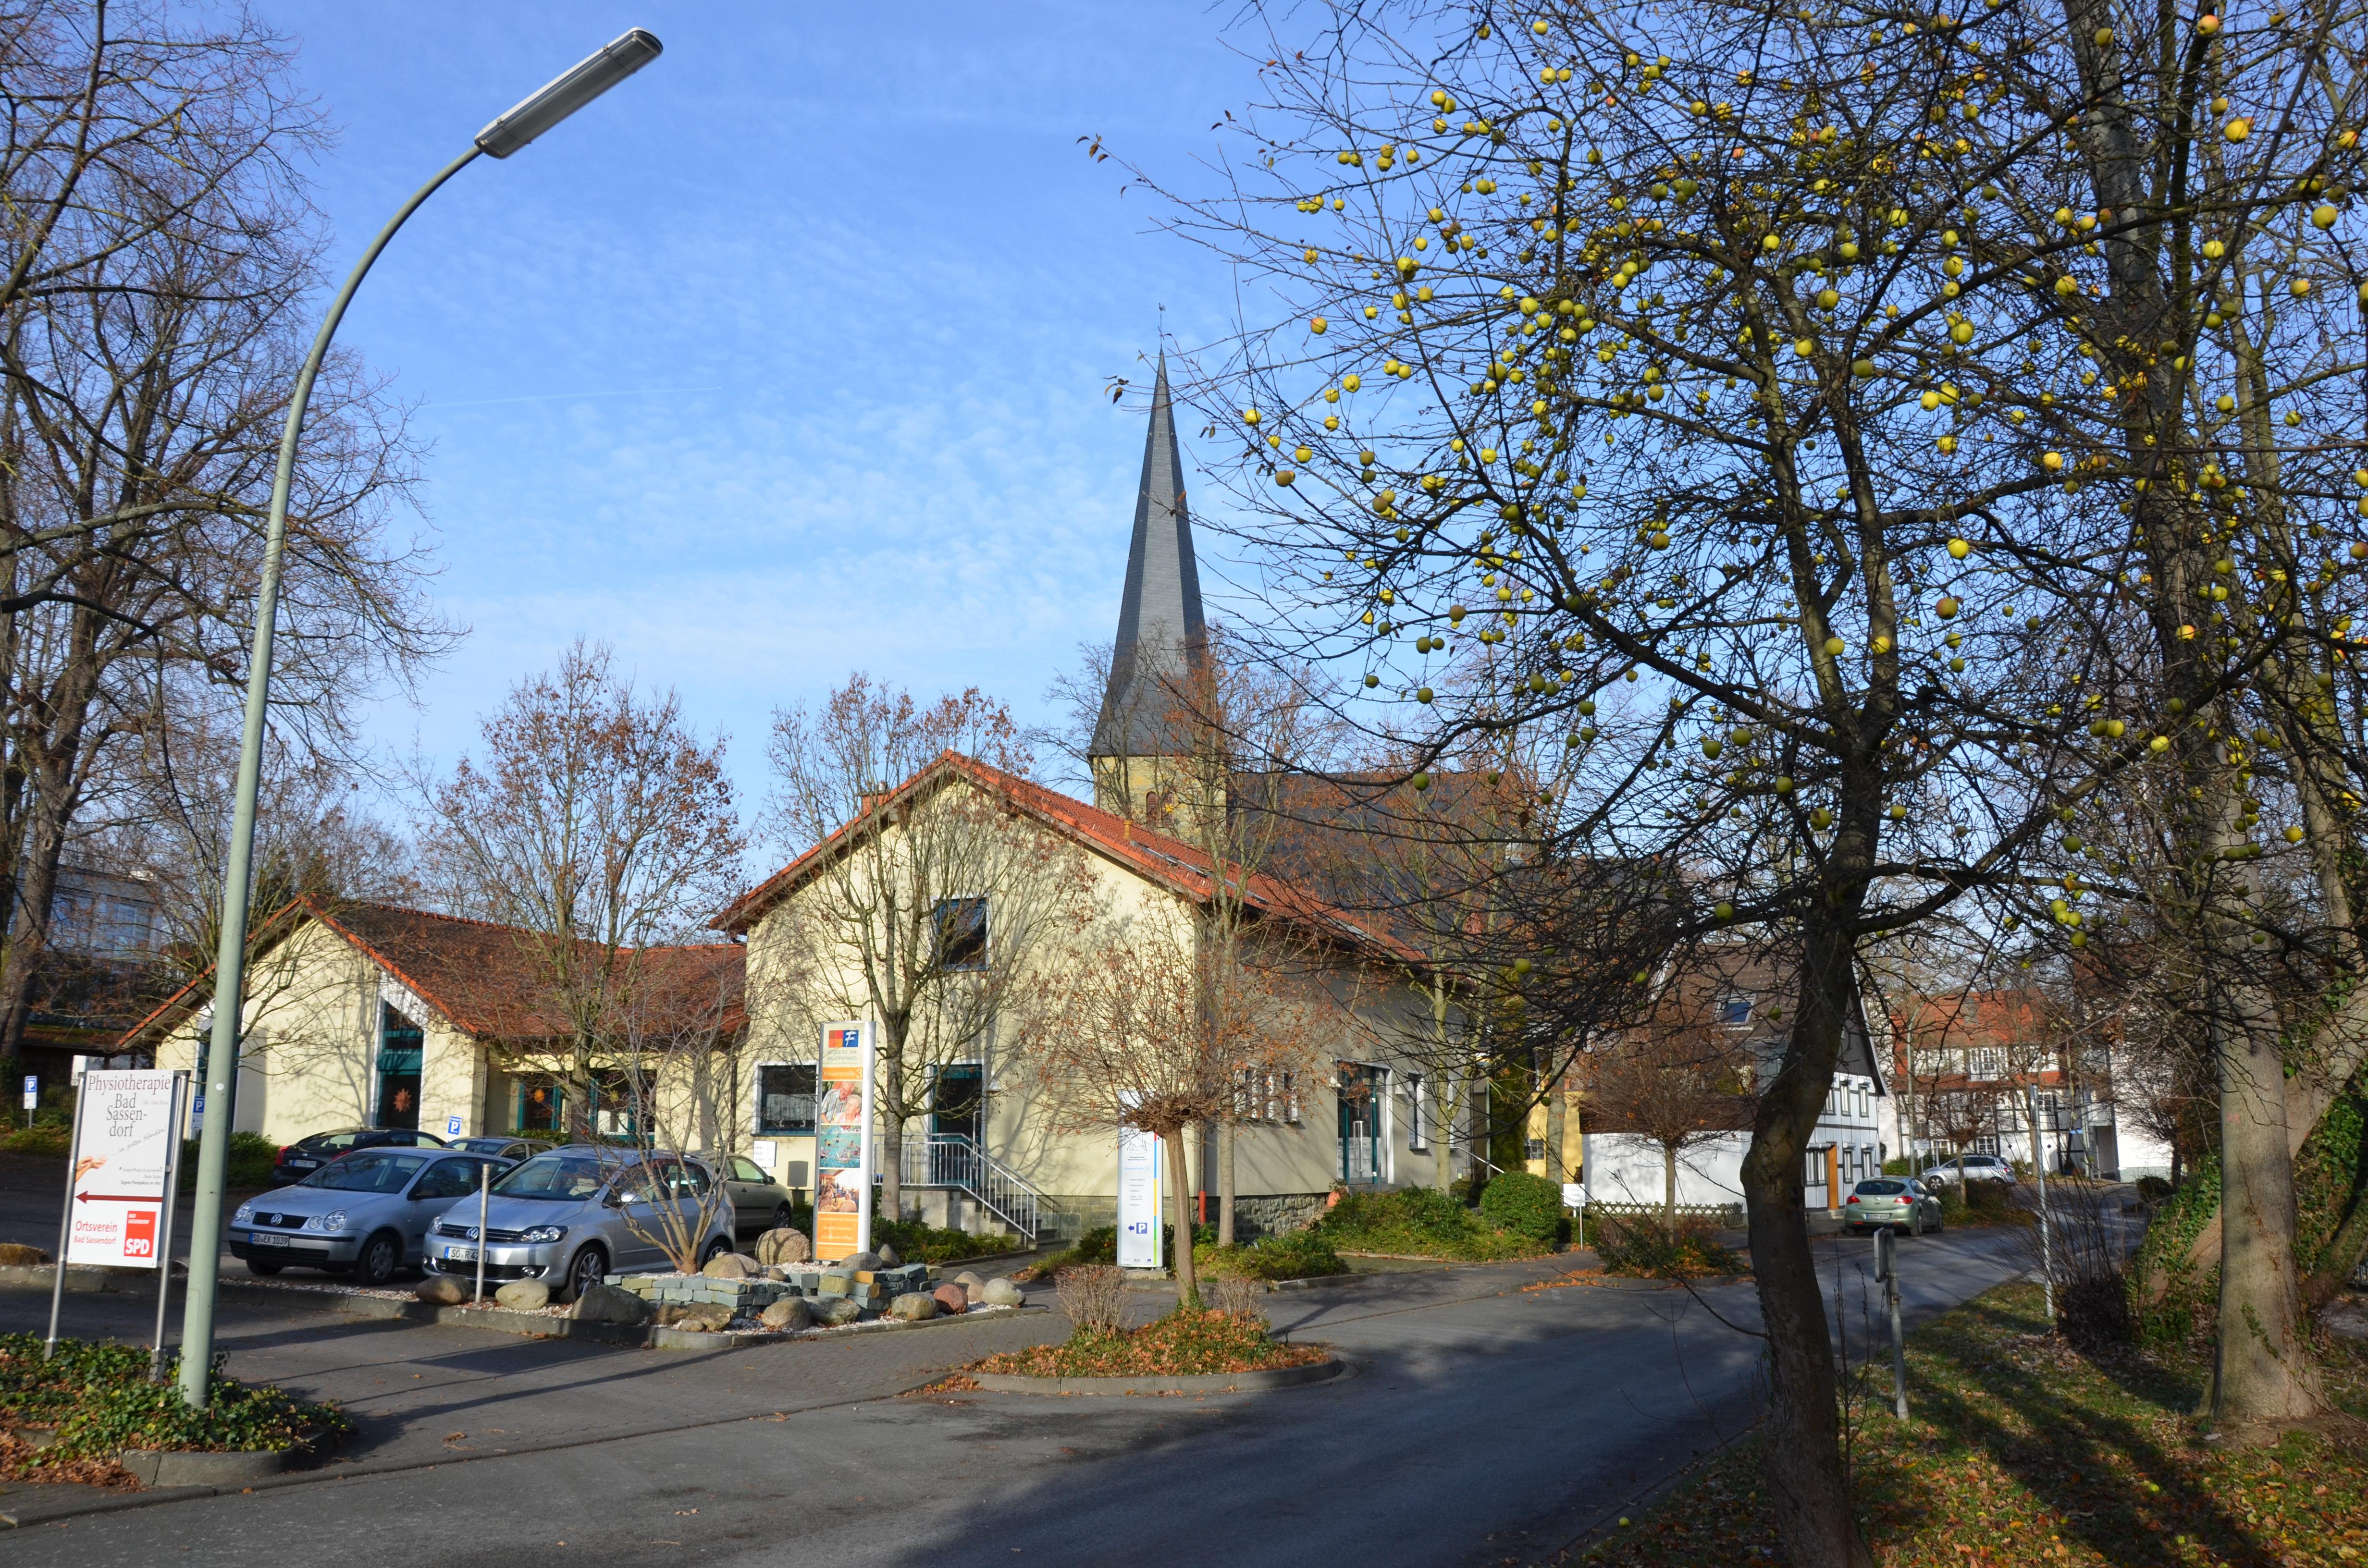 Bettinghausen bad sassendorf rehakliniken in sports betting what is the spread